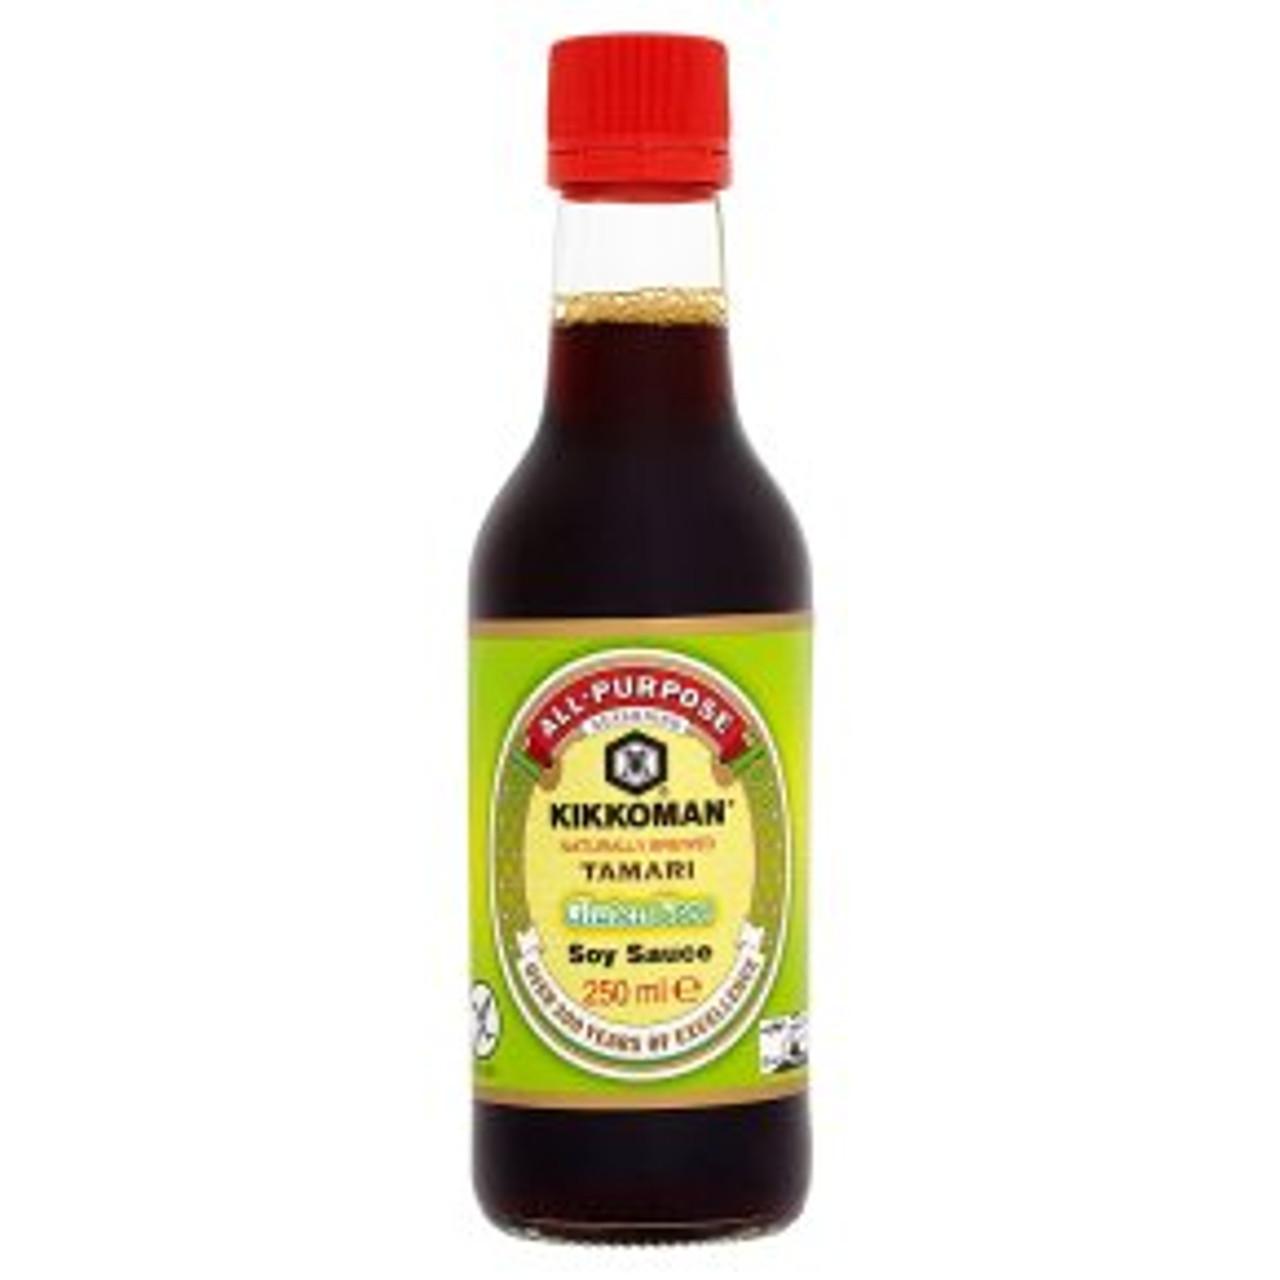 Kikkoman Tamari Soy Sauce - Gluten Free